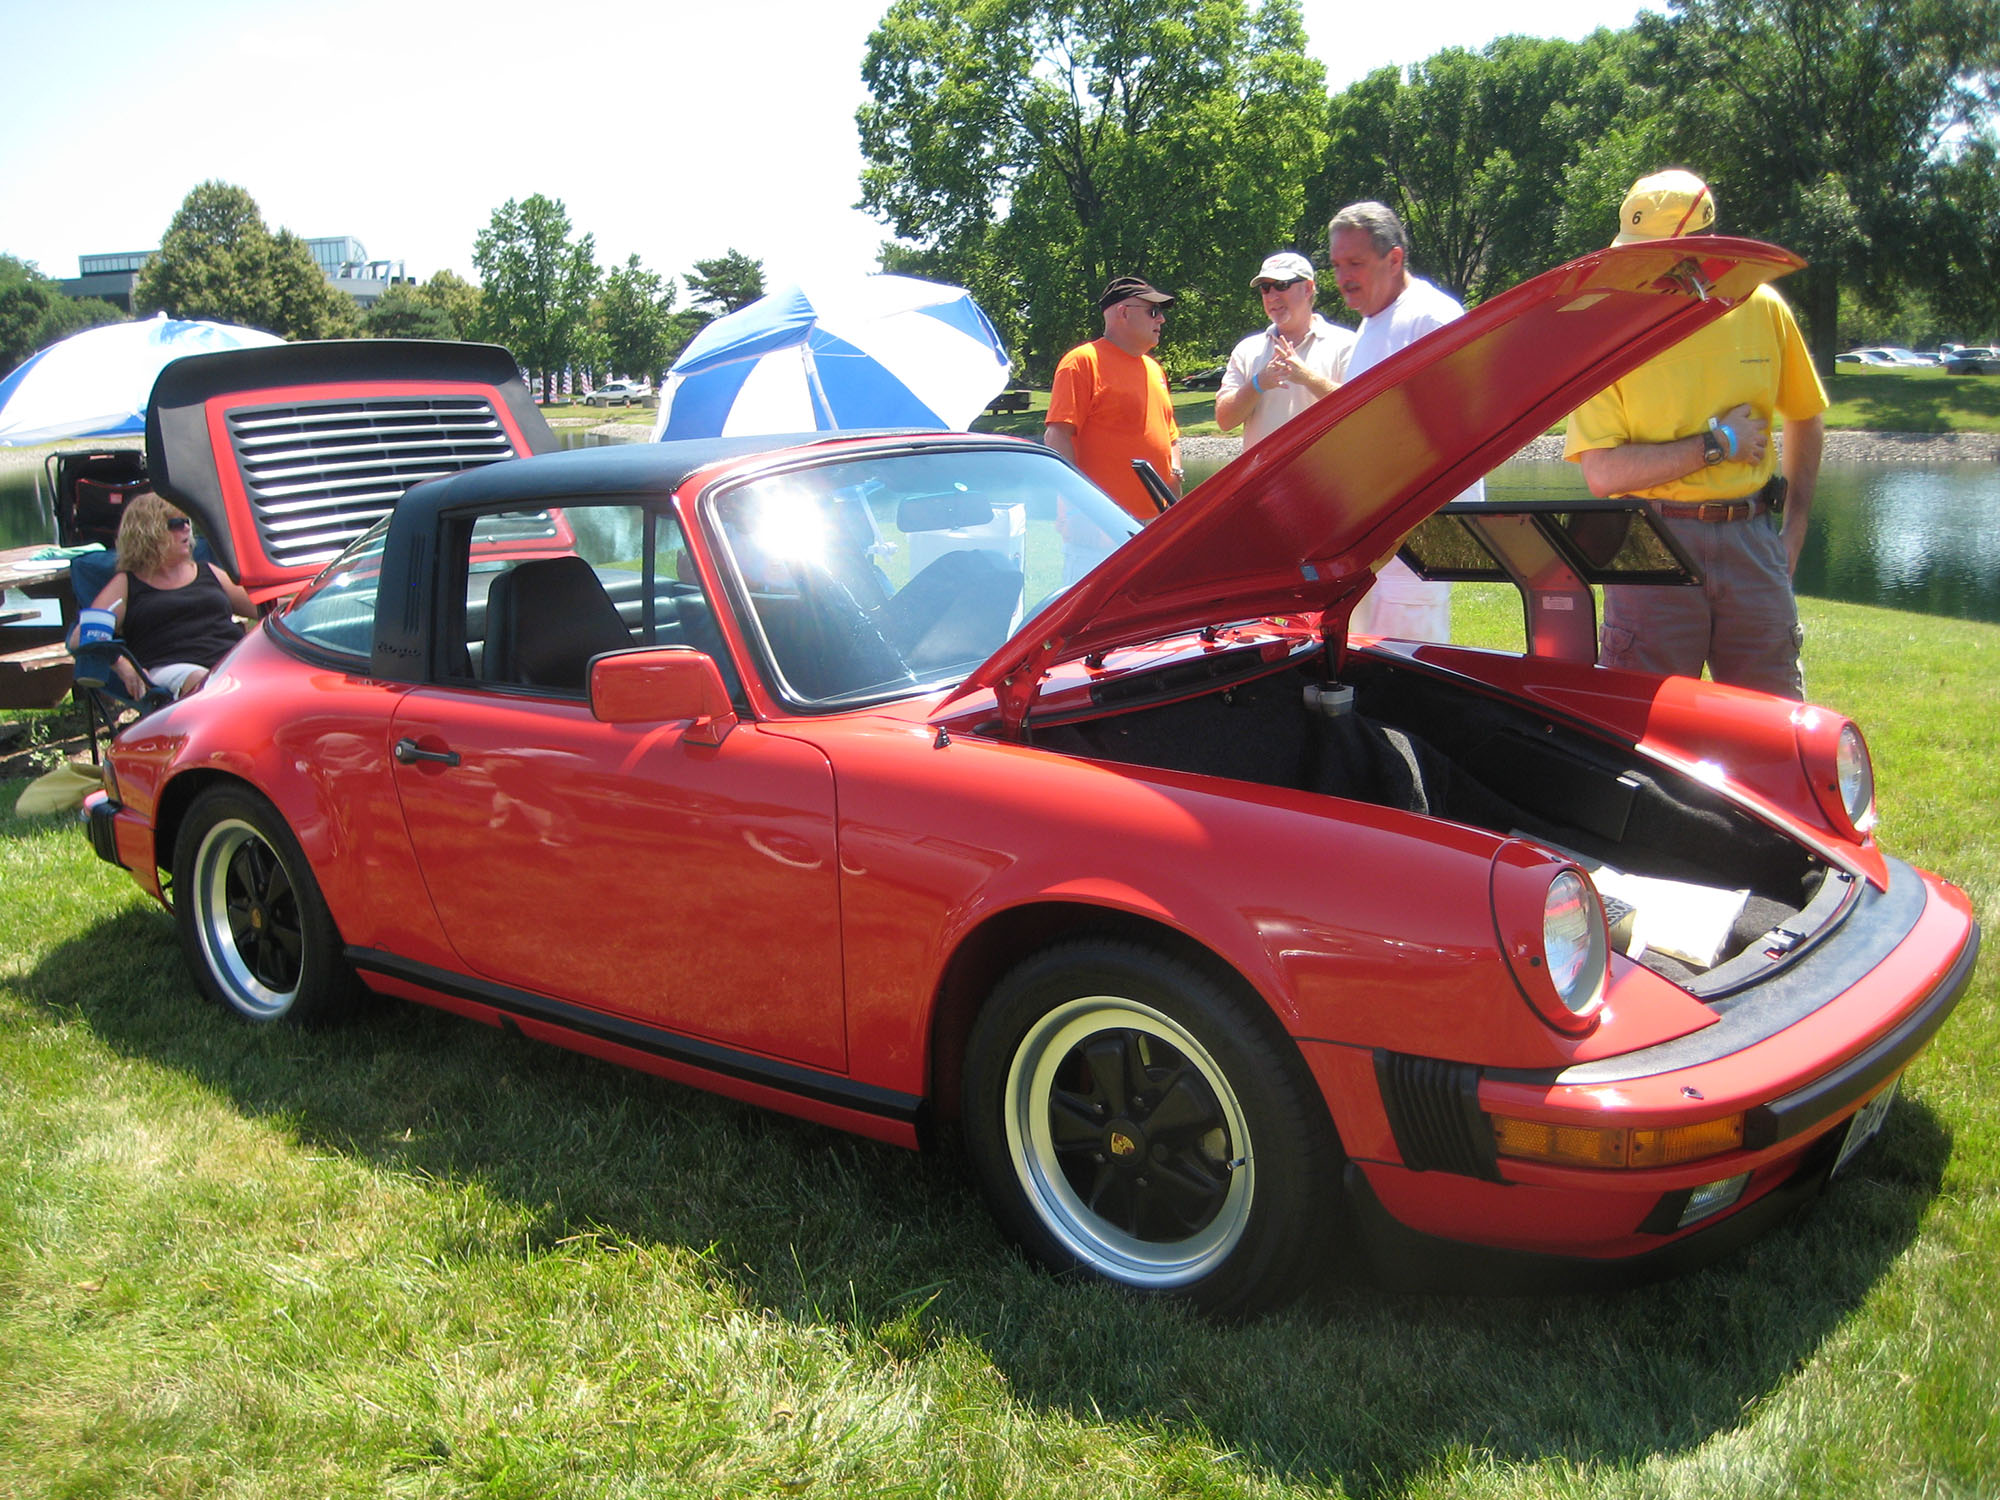 1984 Porsche 911 Targa in Guards Red